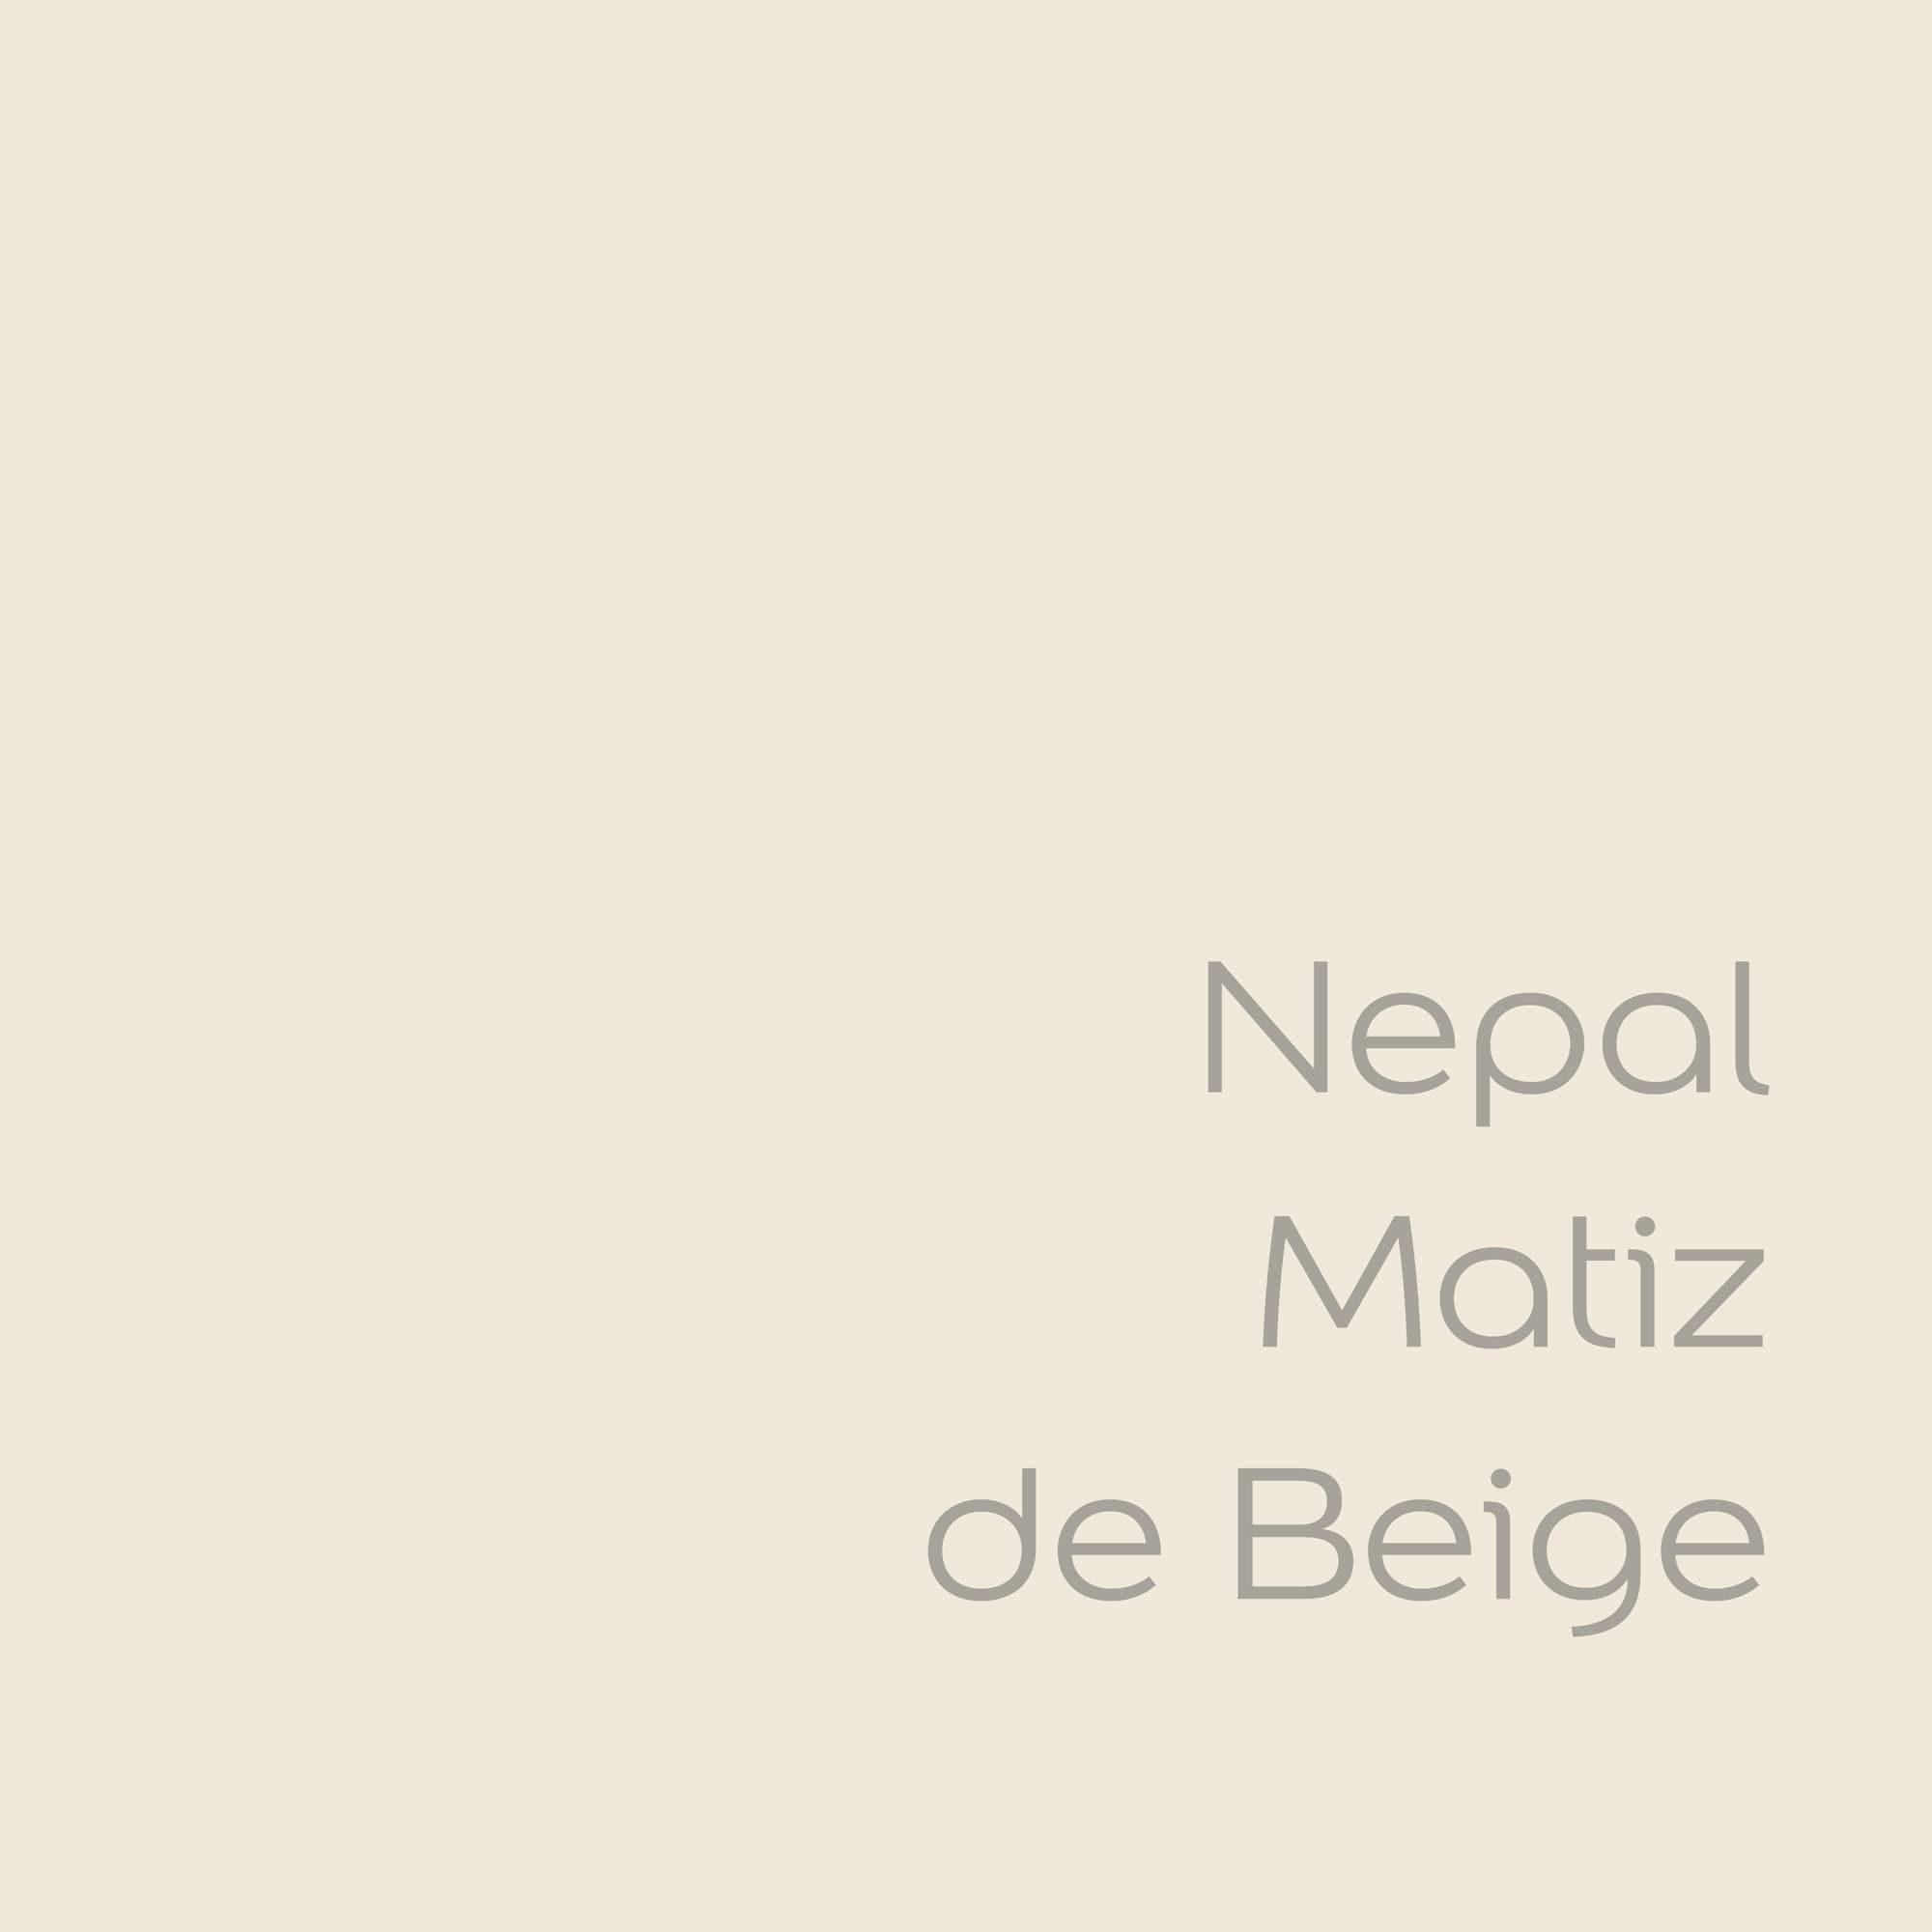 tester de color de pintura bruguer nepal matiz de beige color